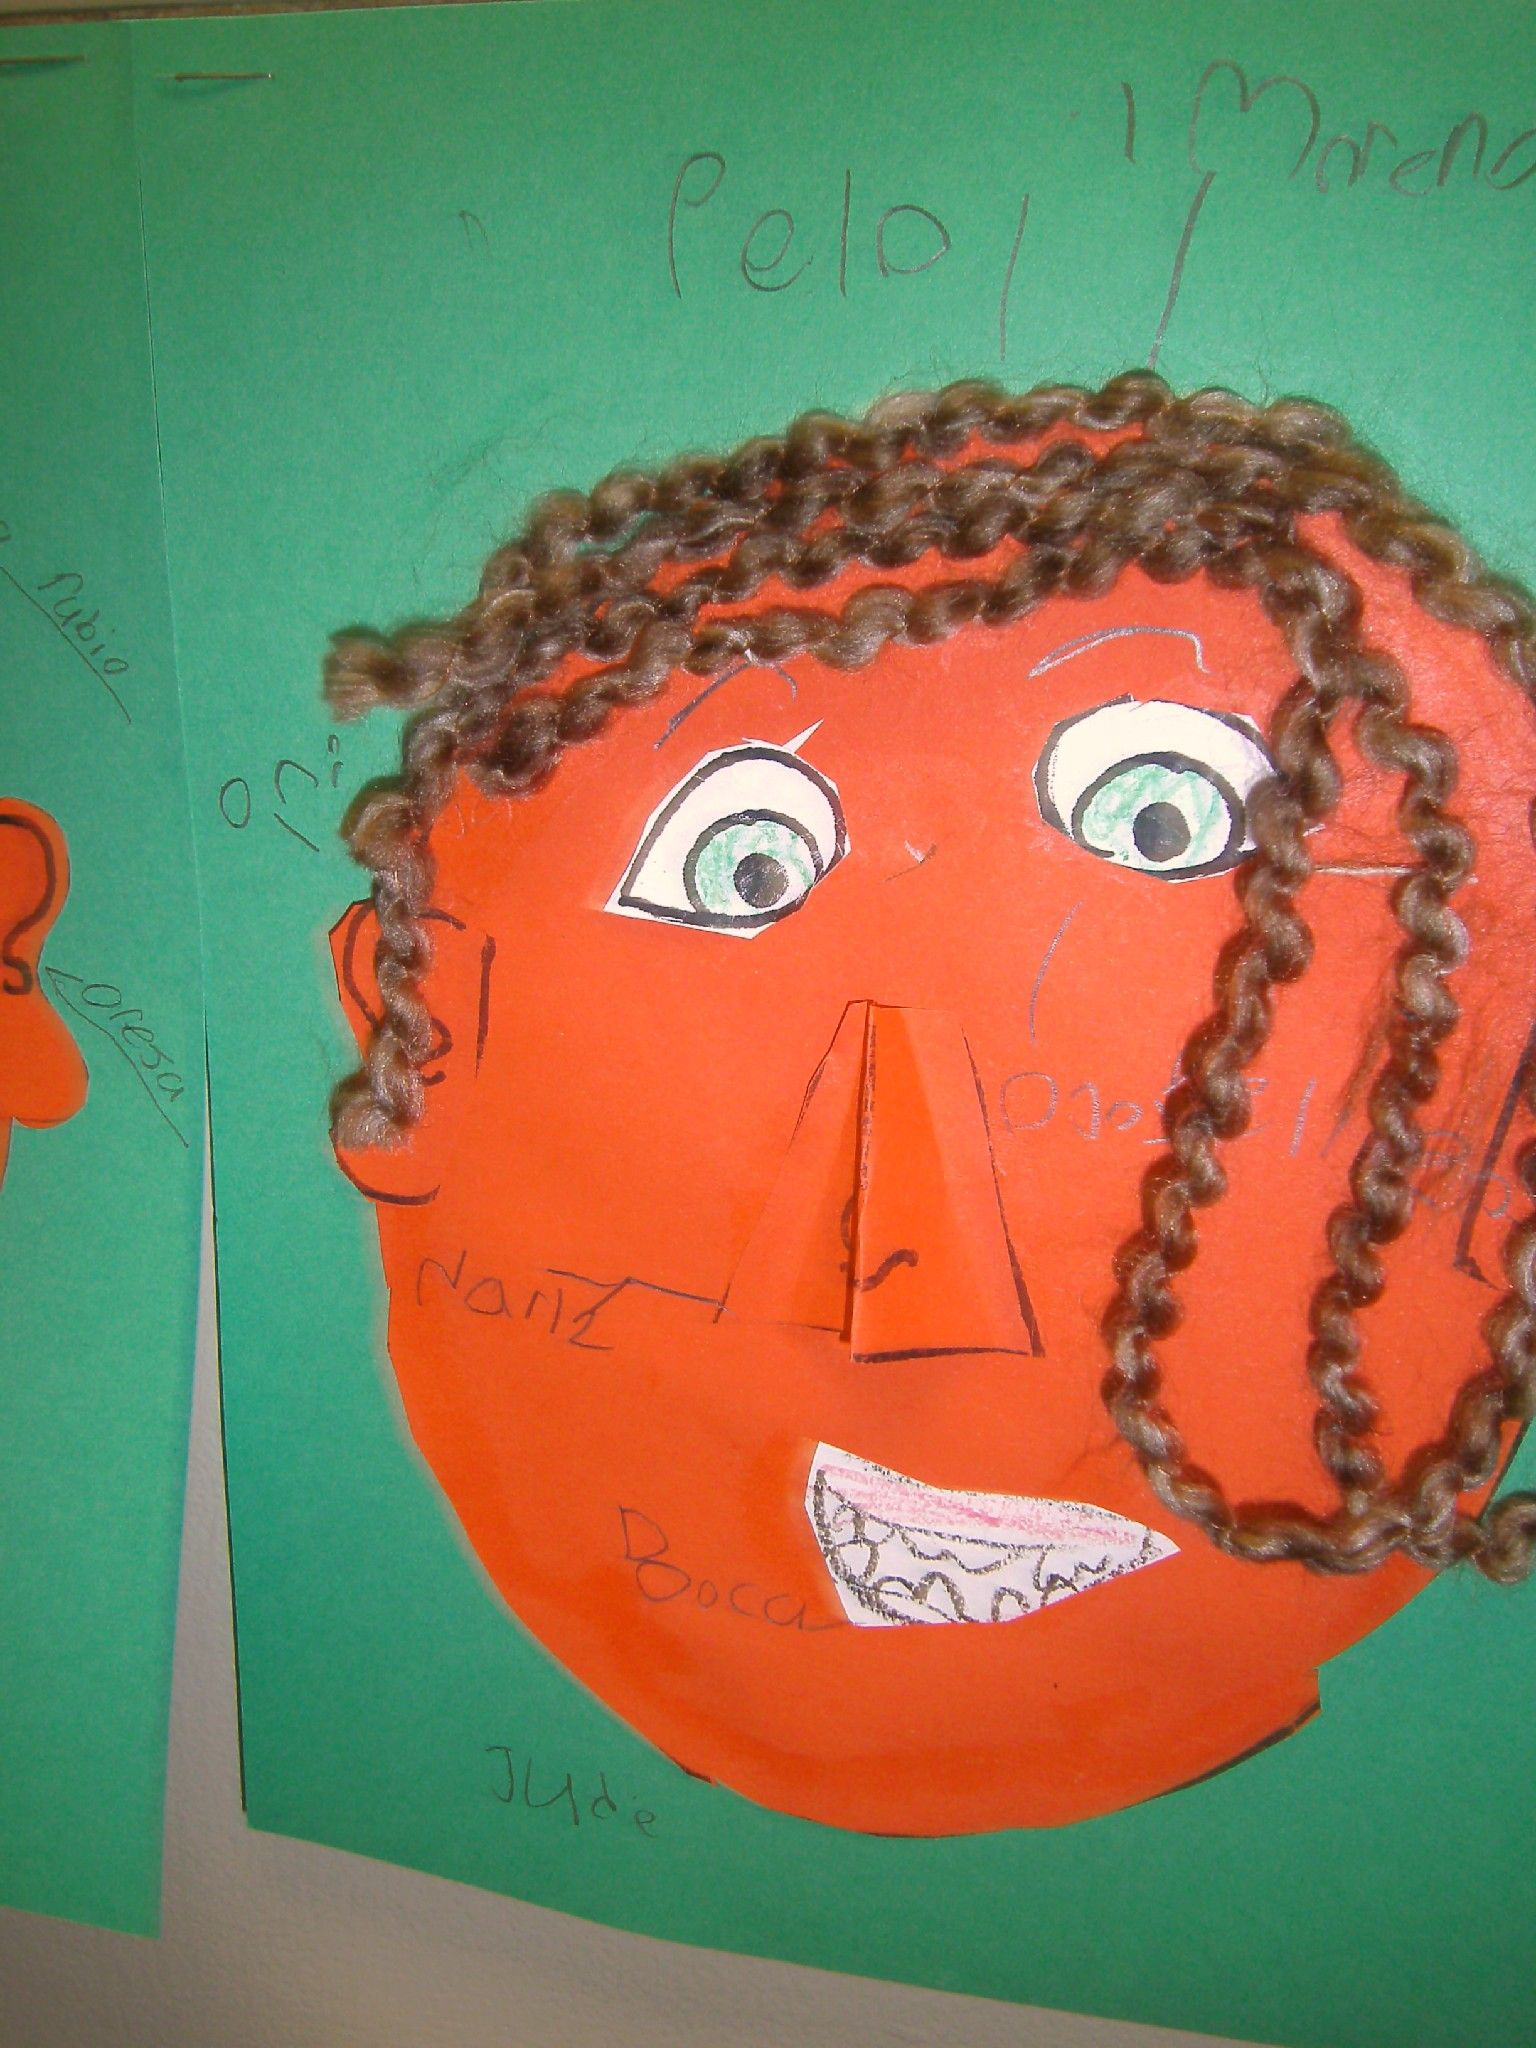 Brookeside montessori school bechtelsville pa